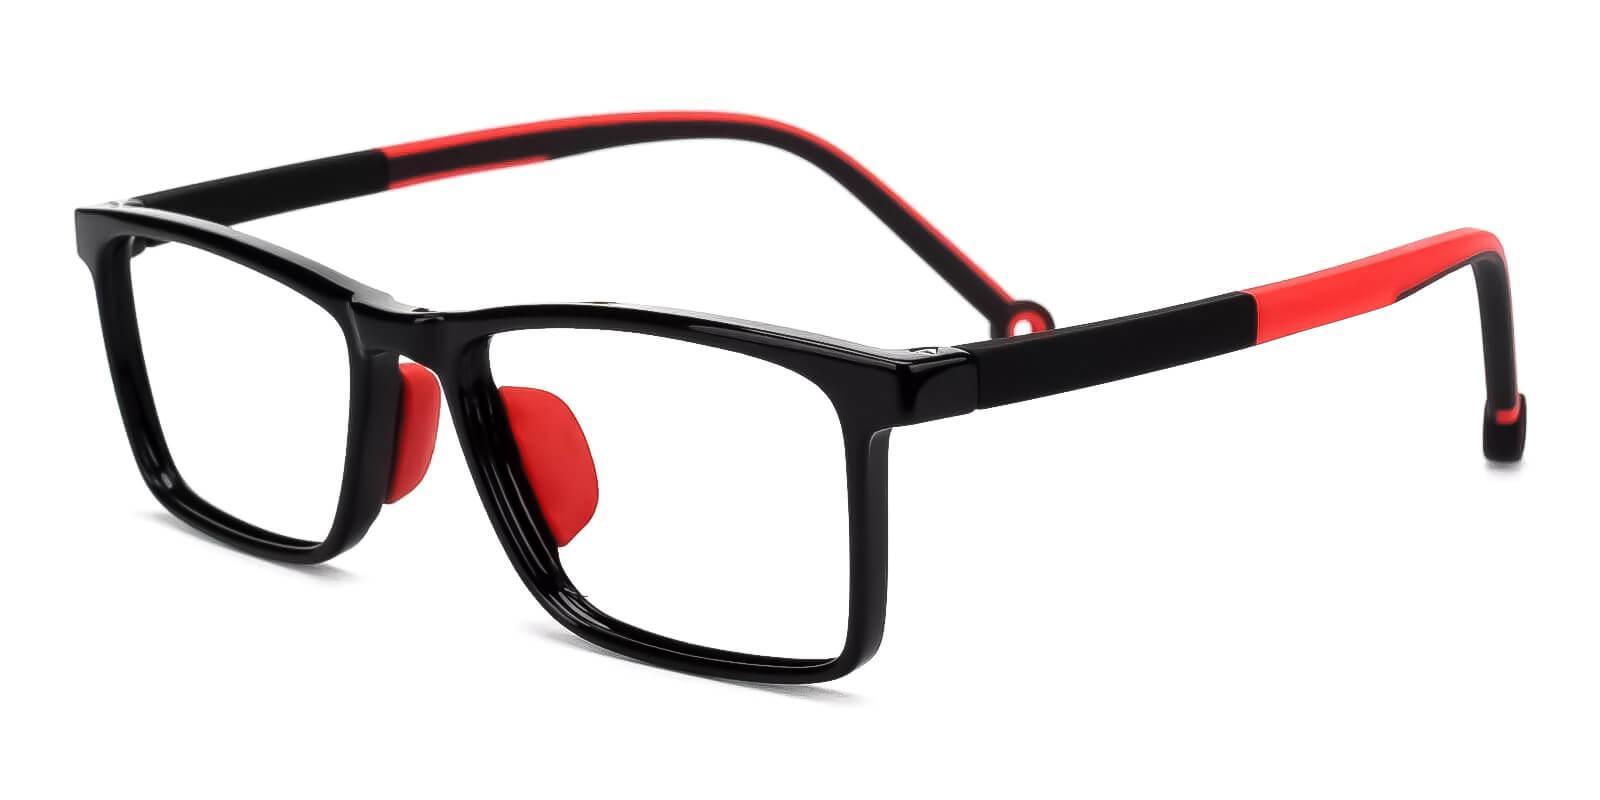 Kids-Rapture Red TR Eyeglasses , Fashion , UniversalBridgeFit Frames from ABBE Glasses